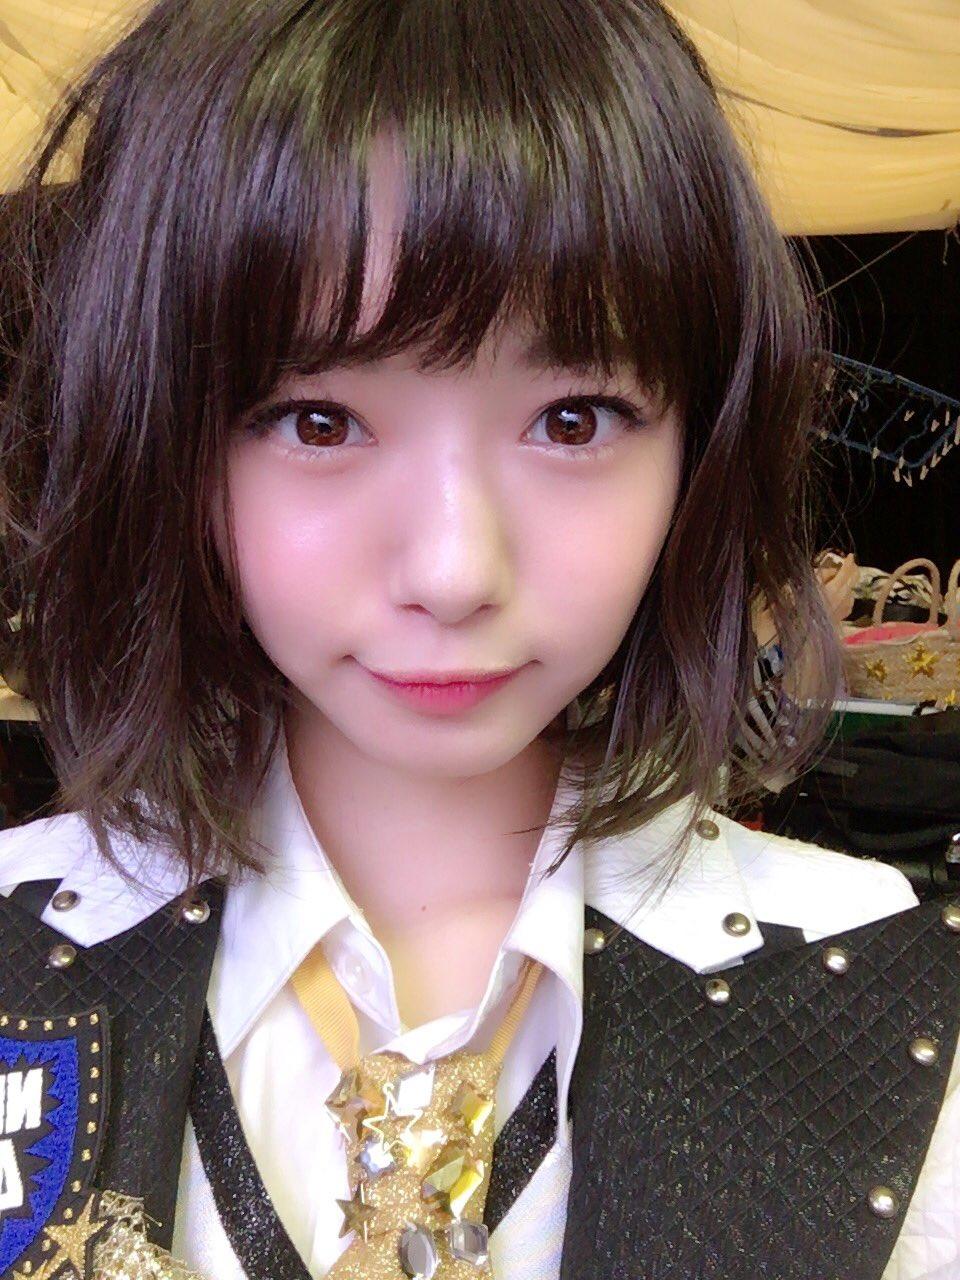 "【NMB48】ショートカット美少女""市川美織""爆誕キタ━━━━(゚∀゚)━━━━!!"